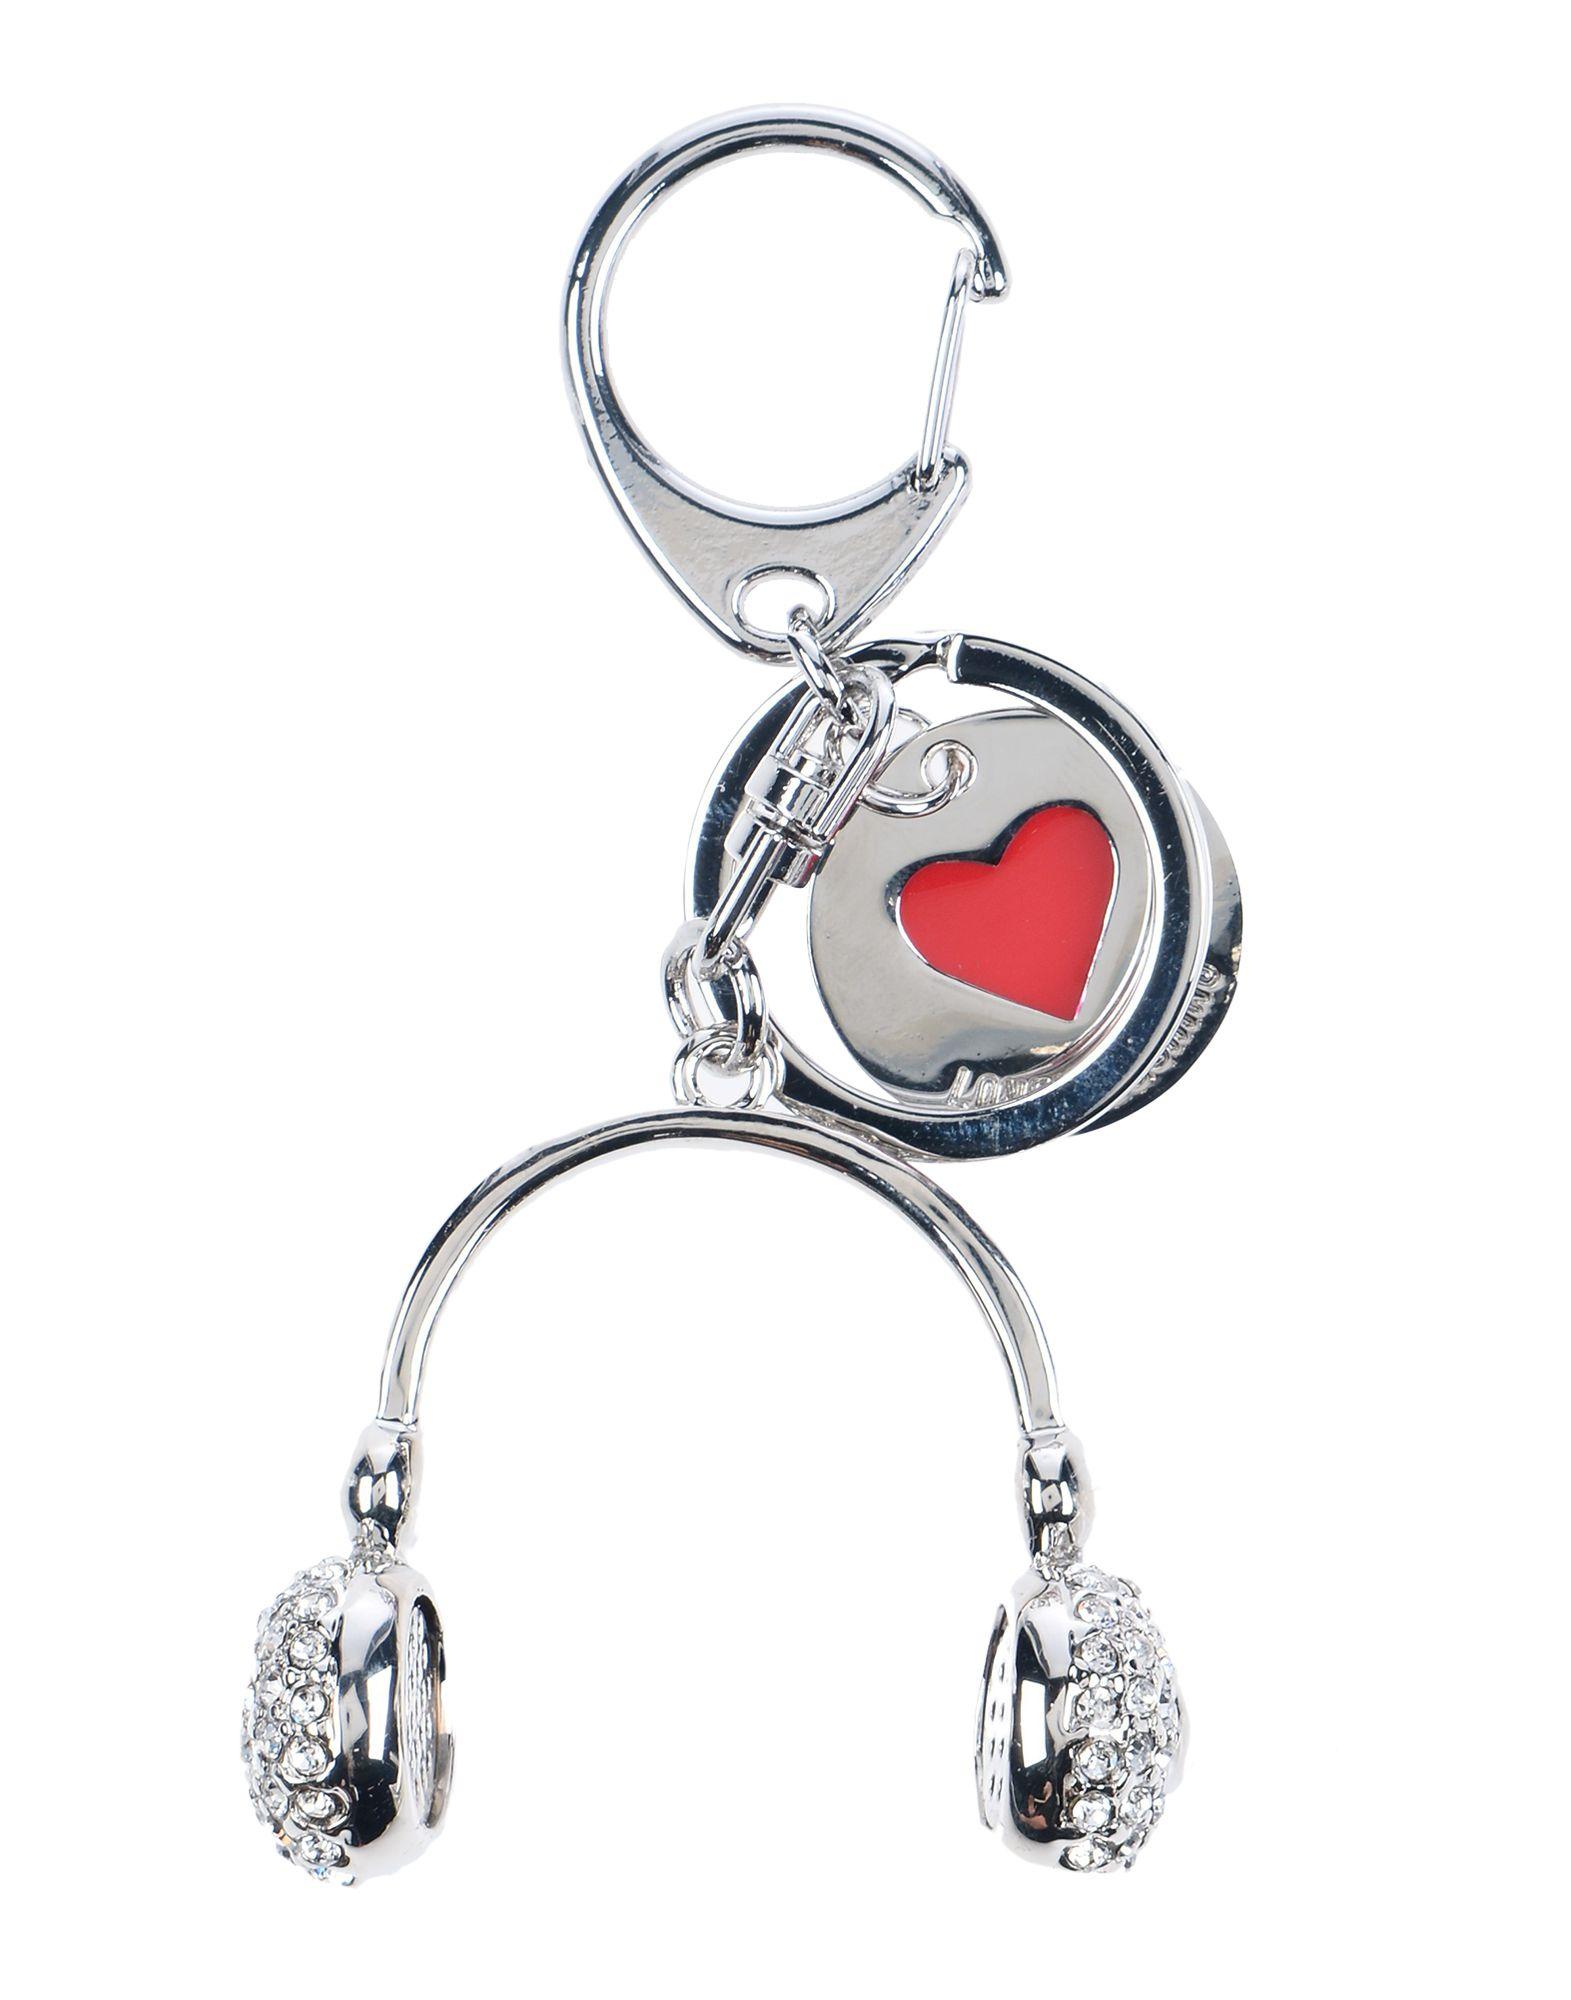 LOVE MOSCHINO Брелок для ключей jobon bangzhong брелок для ключей кольцо брелок для ключей мать двойной брелок застежка молния талия висячий тип zb 060c хром